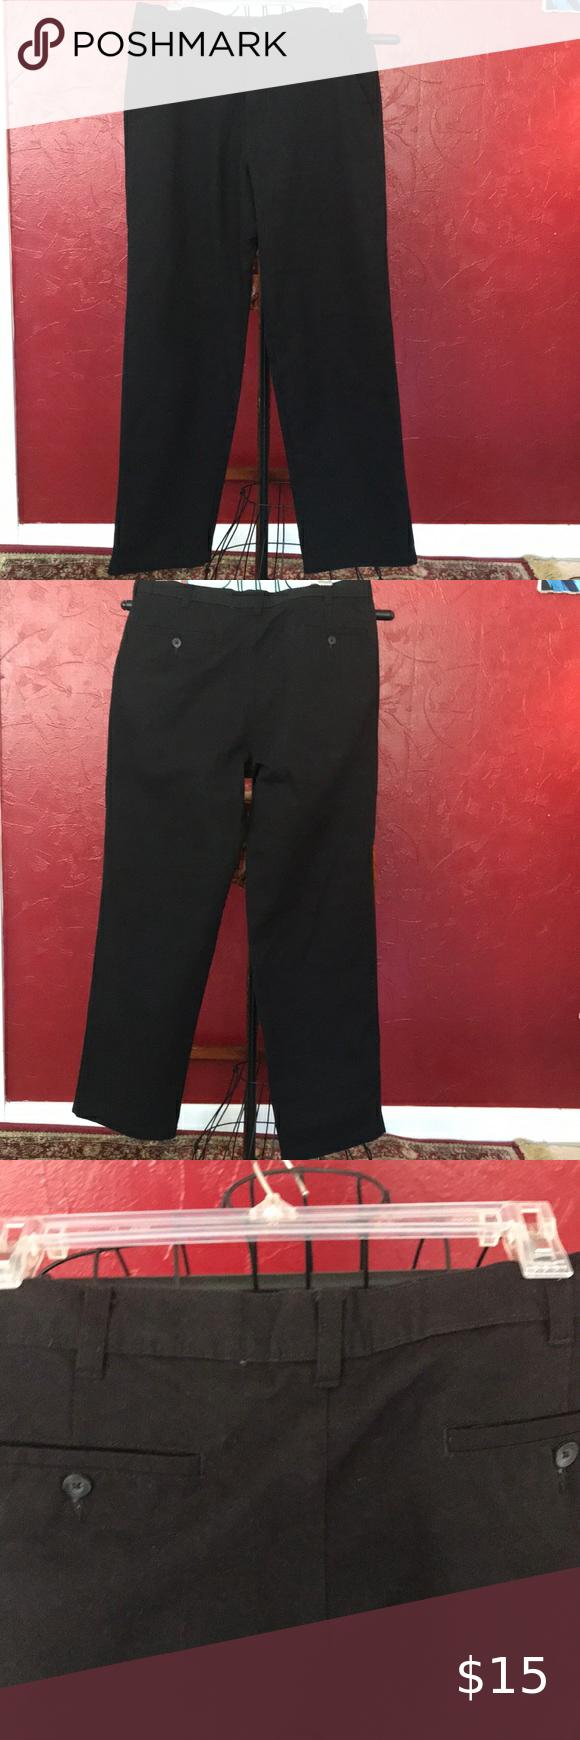 George Men S Black Dress Pants In 2020 Black Dress Pants Black Dress Pants Men Black Dress Slacks [ 1740 x 580 Pixel ]